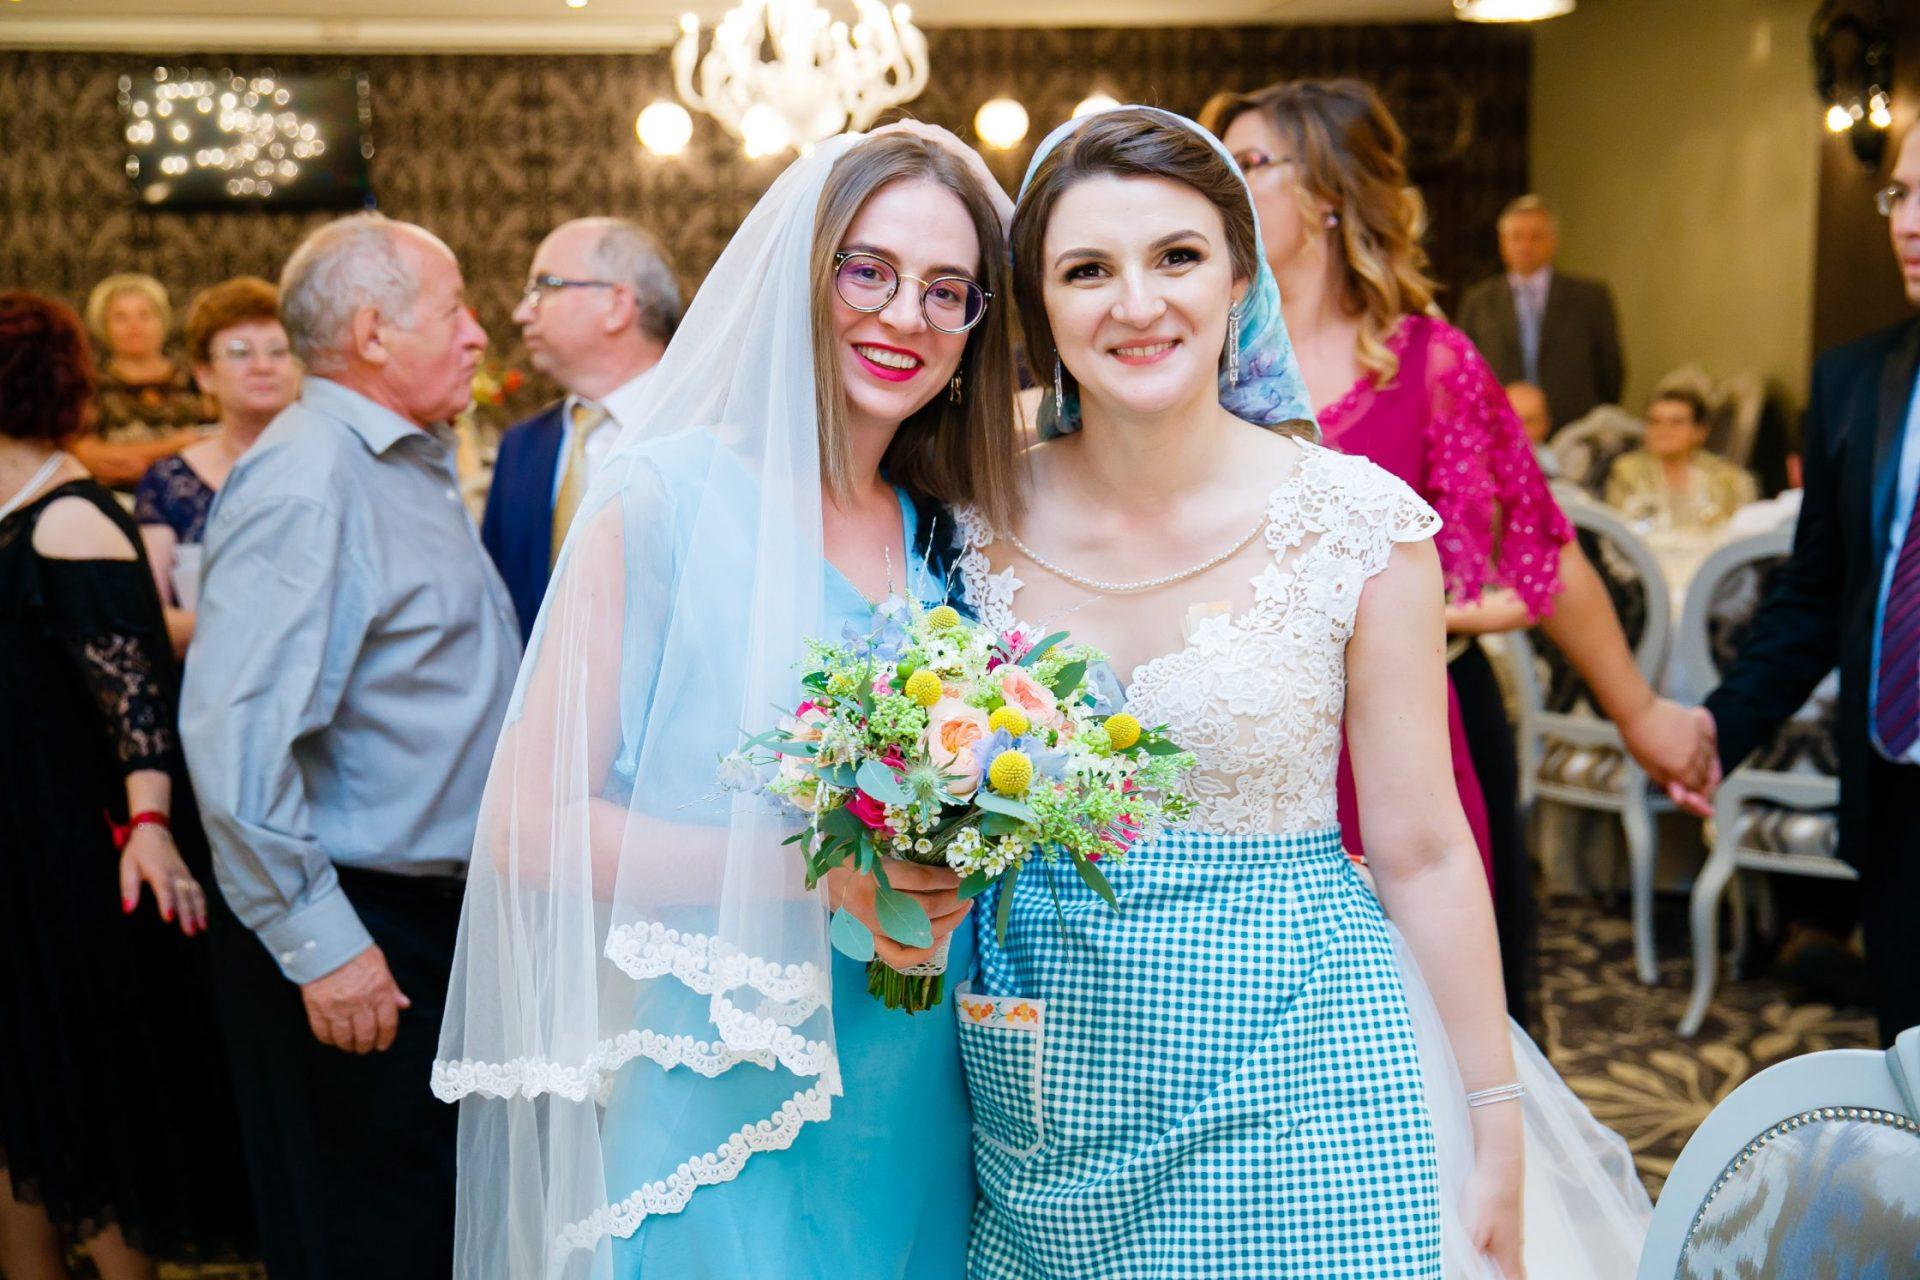 Nunta la Pleiada Iasi Alexandra si Vlad domnisoara de onoare a prins buchetul www.paulpadurariu.ro © 2017 Paul Padurariu fotograf de nunta iasi